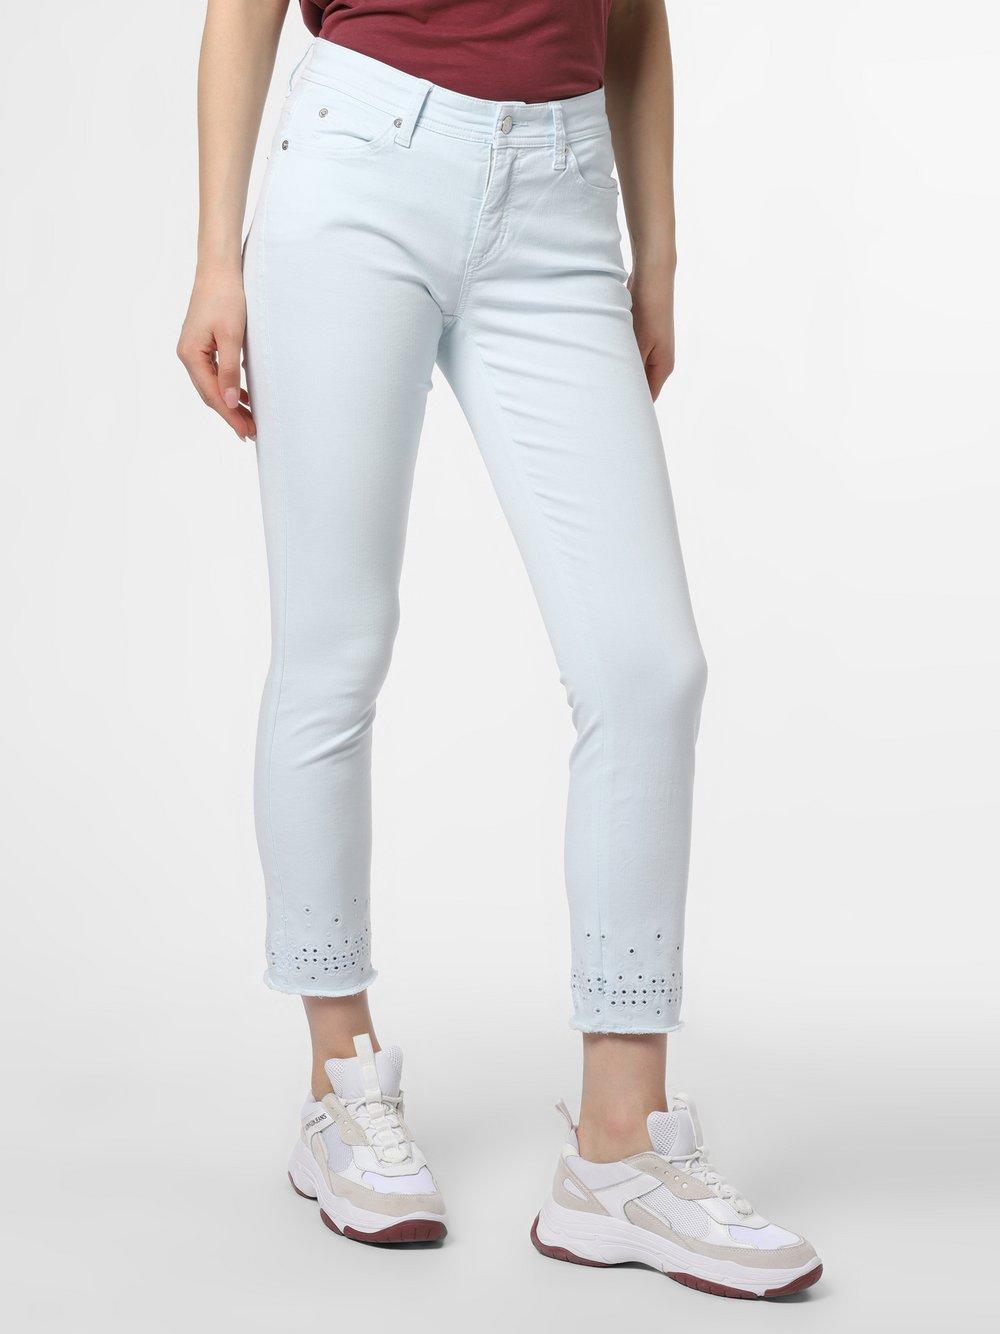 Cambio - Spodnie damskie – Parla, niebieski